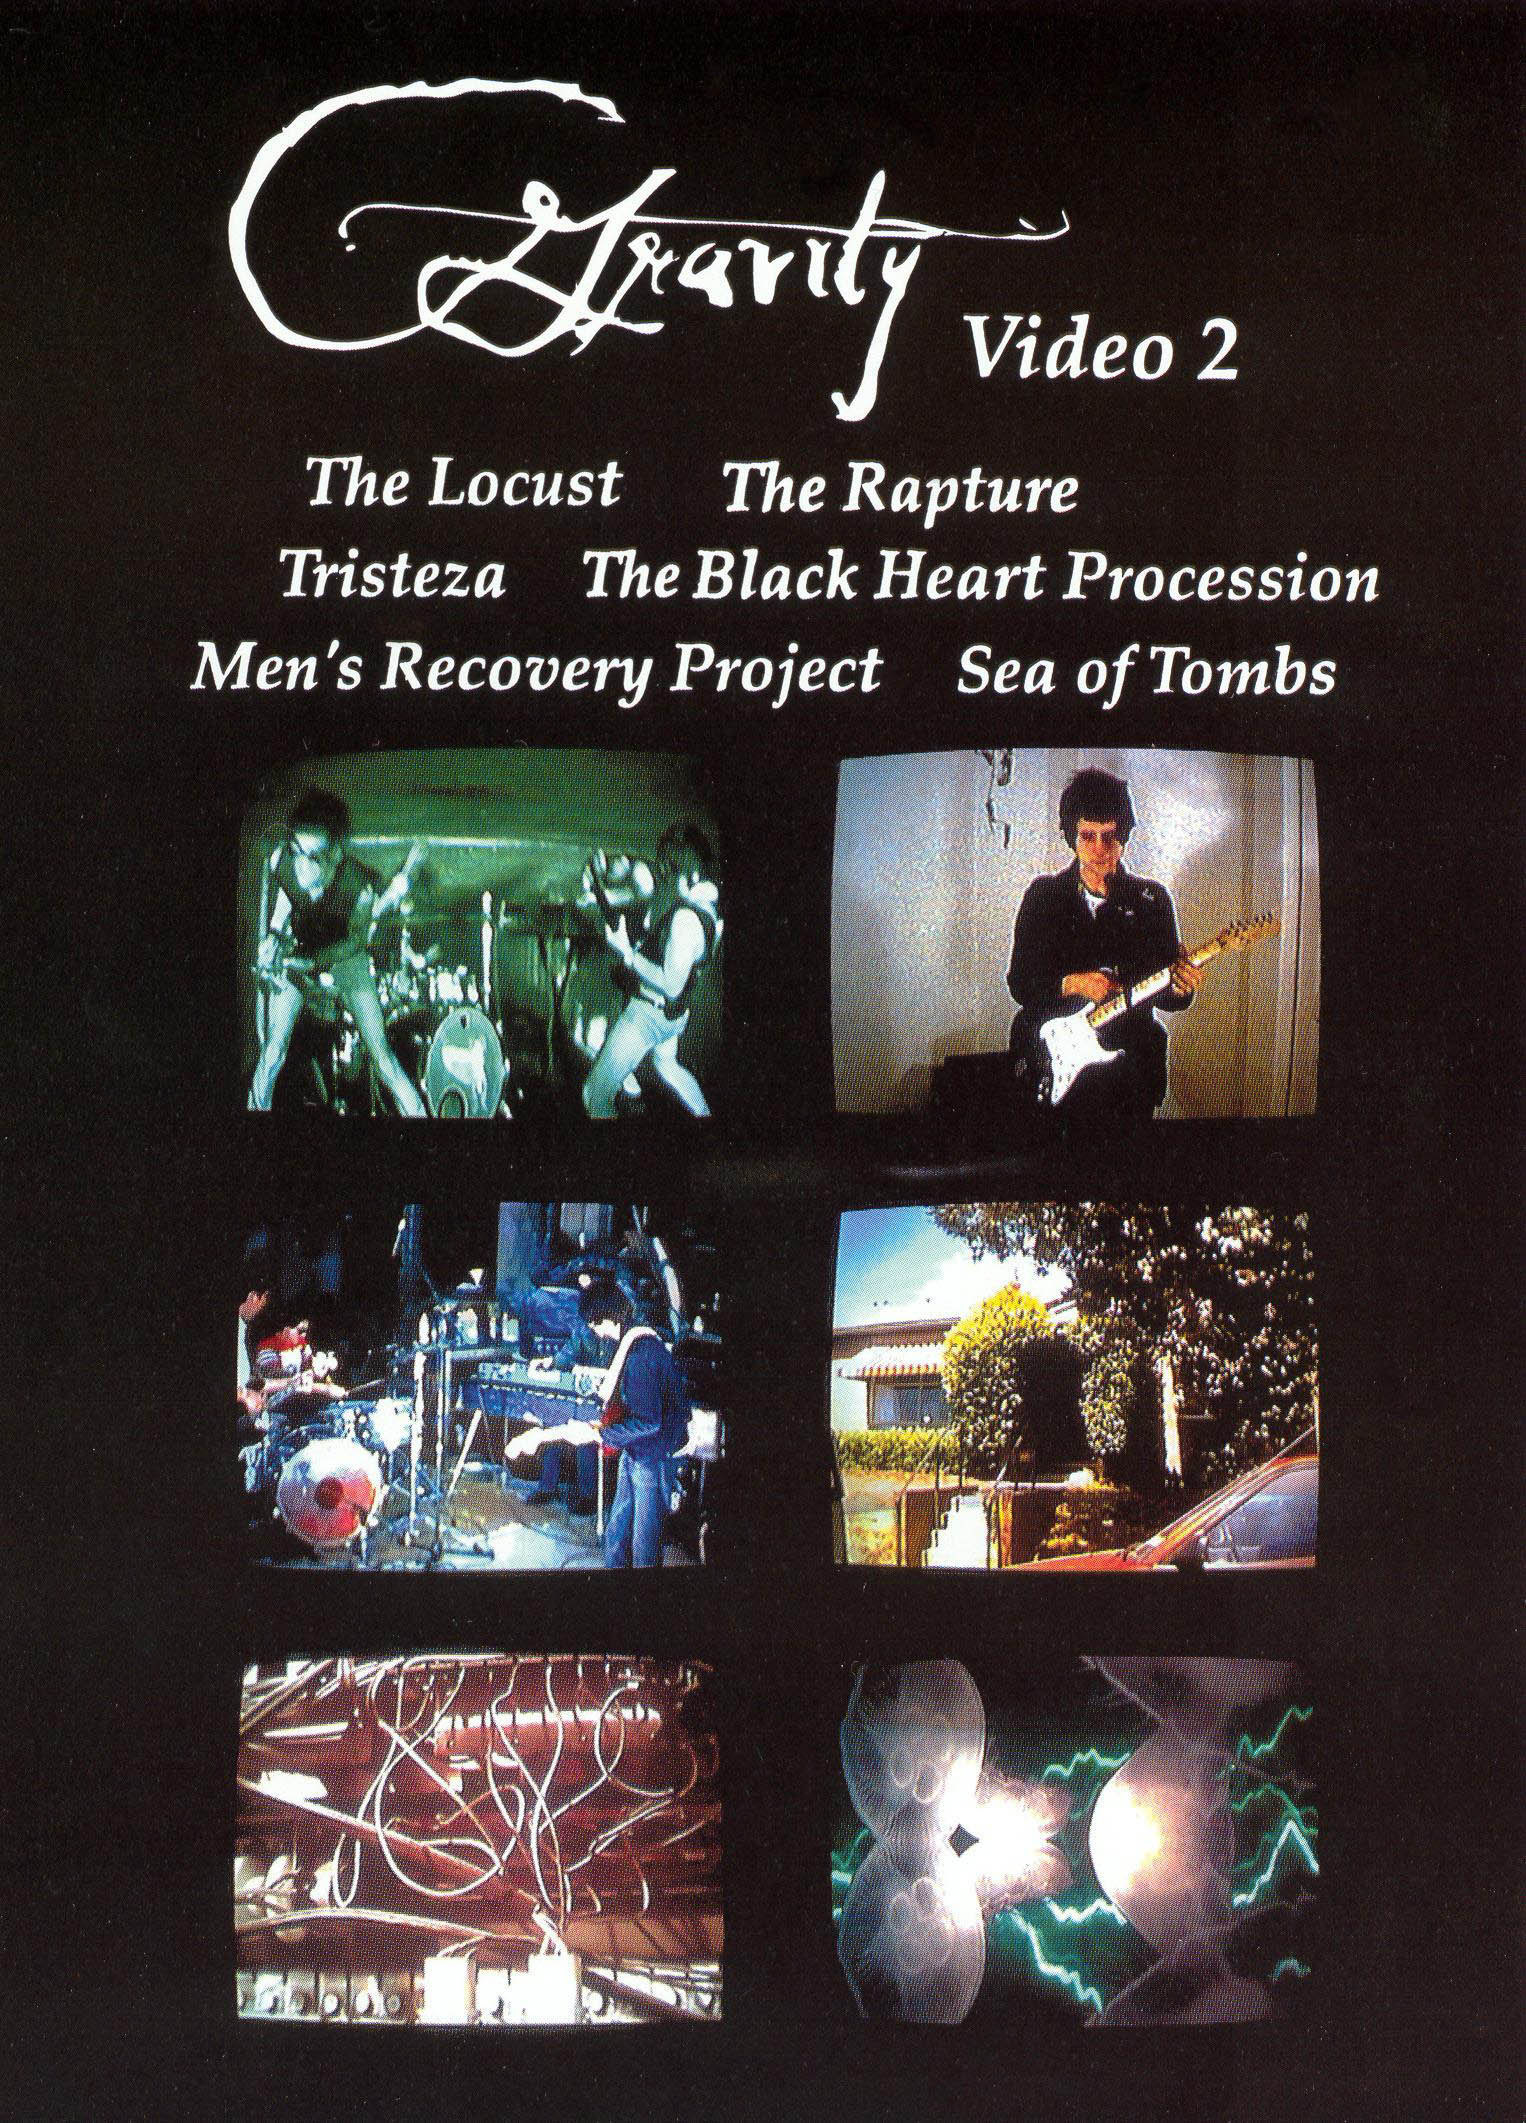 Gravity Video, Vol. 2